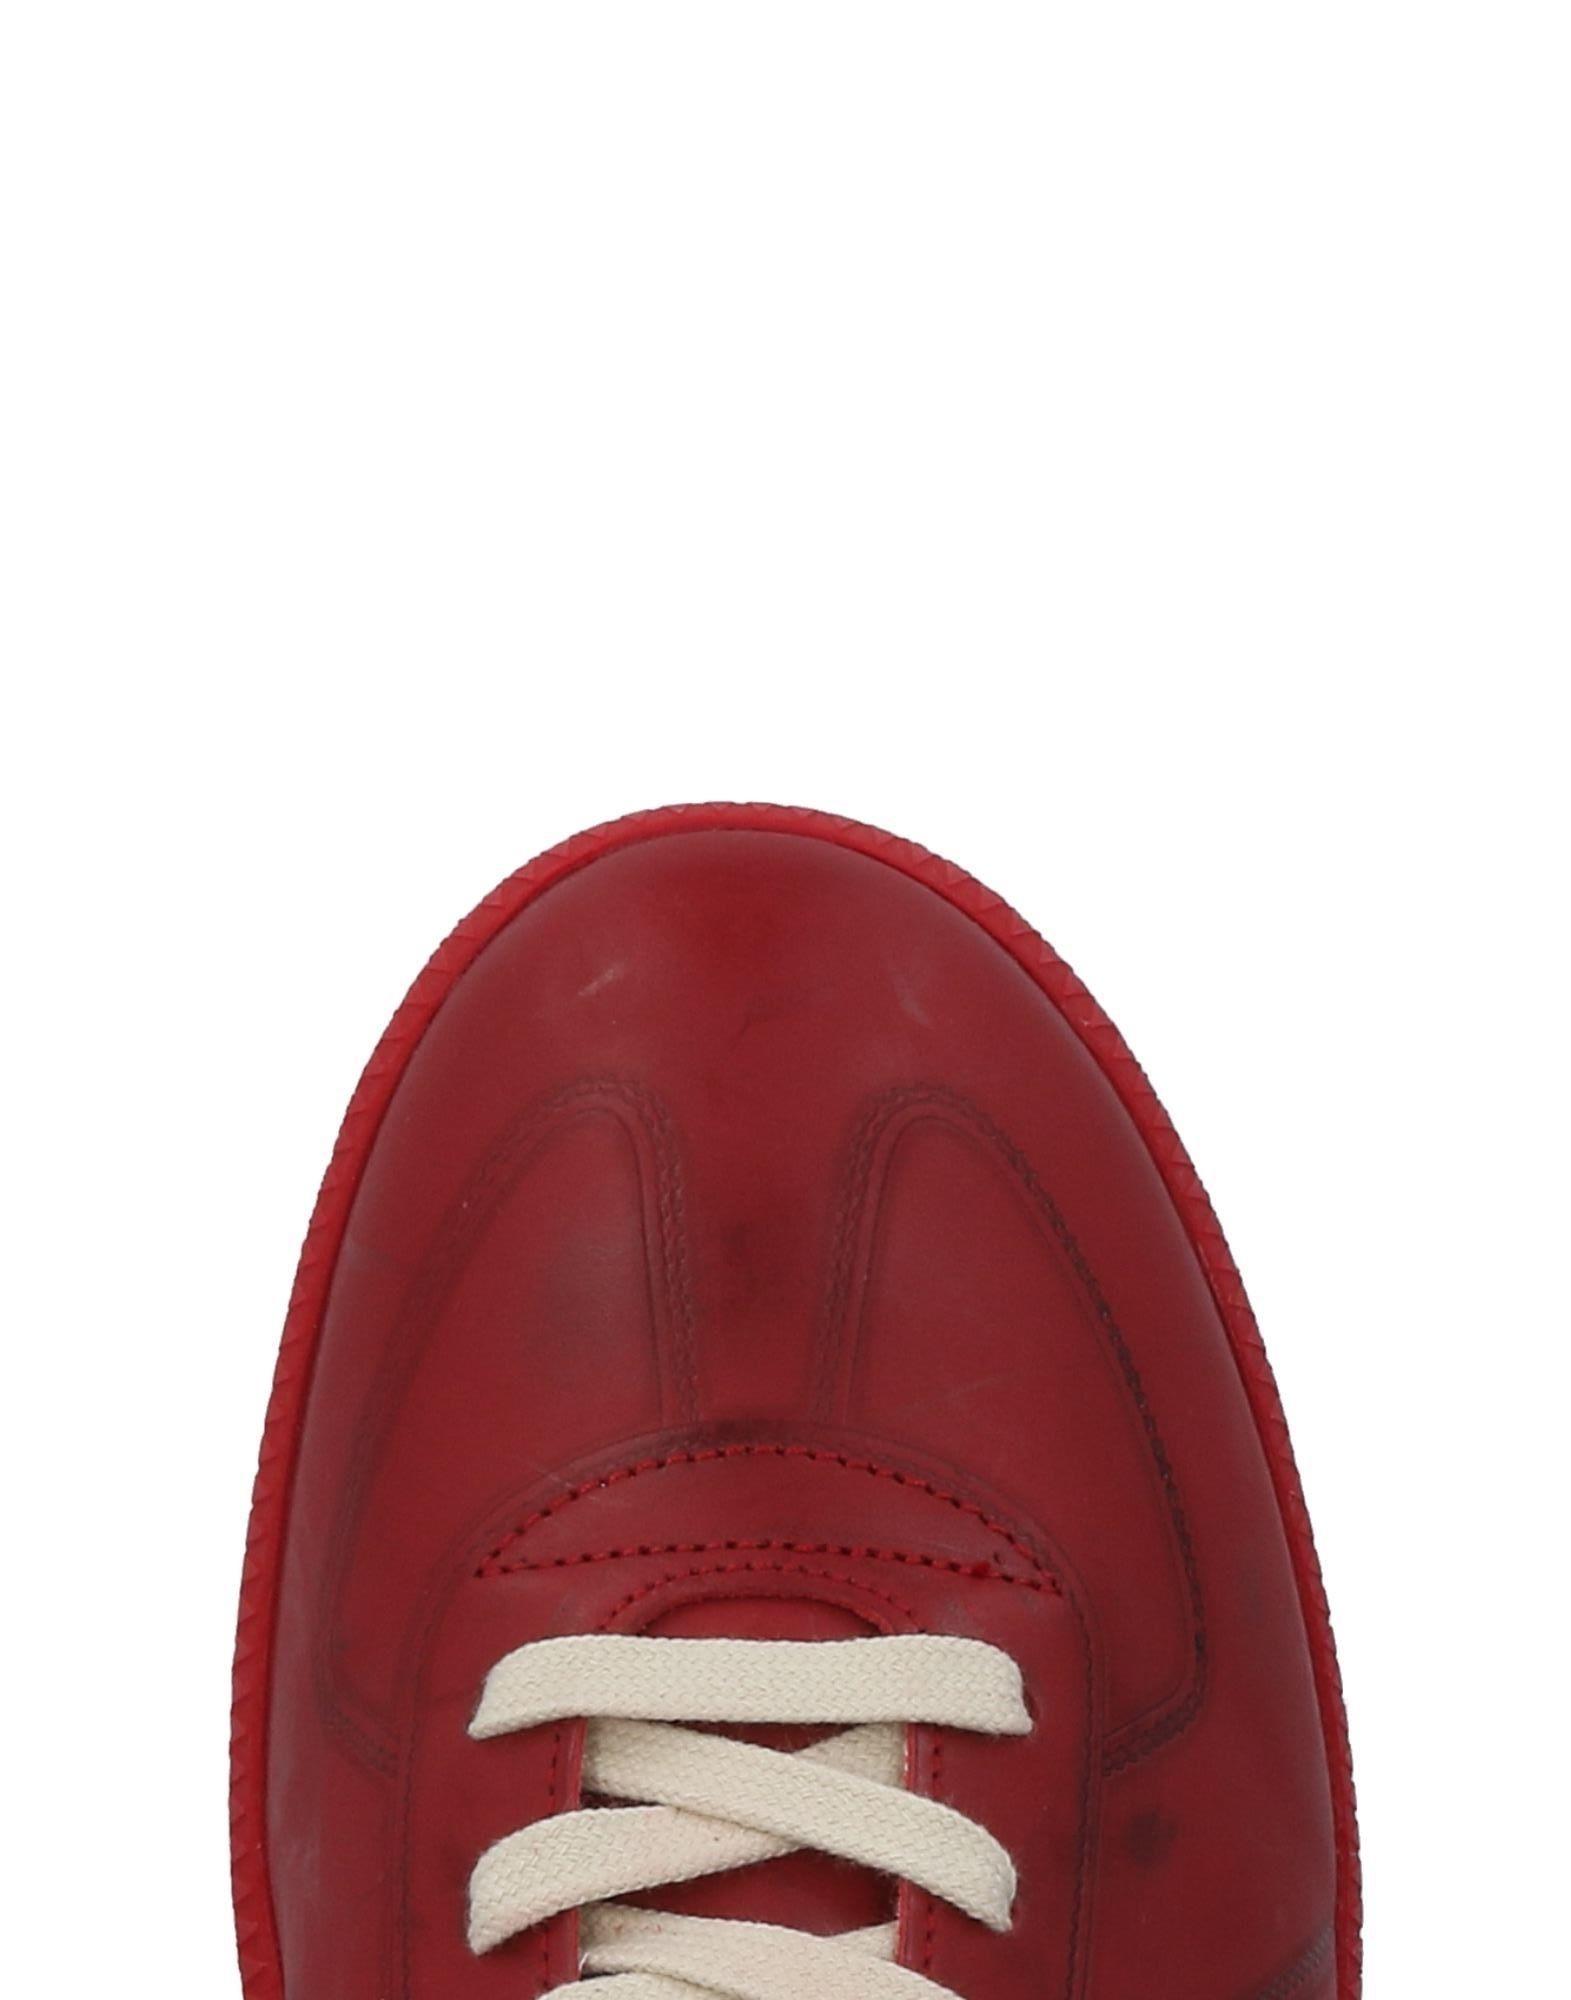 Maison Margiela Sneakers Qualität Herren  11481794TD Gute Qualität Sneakers beliebte Schuhe f4aac4